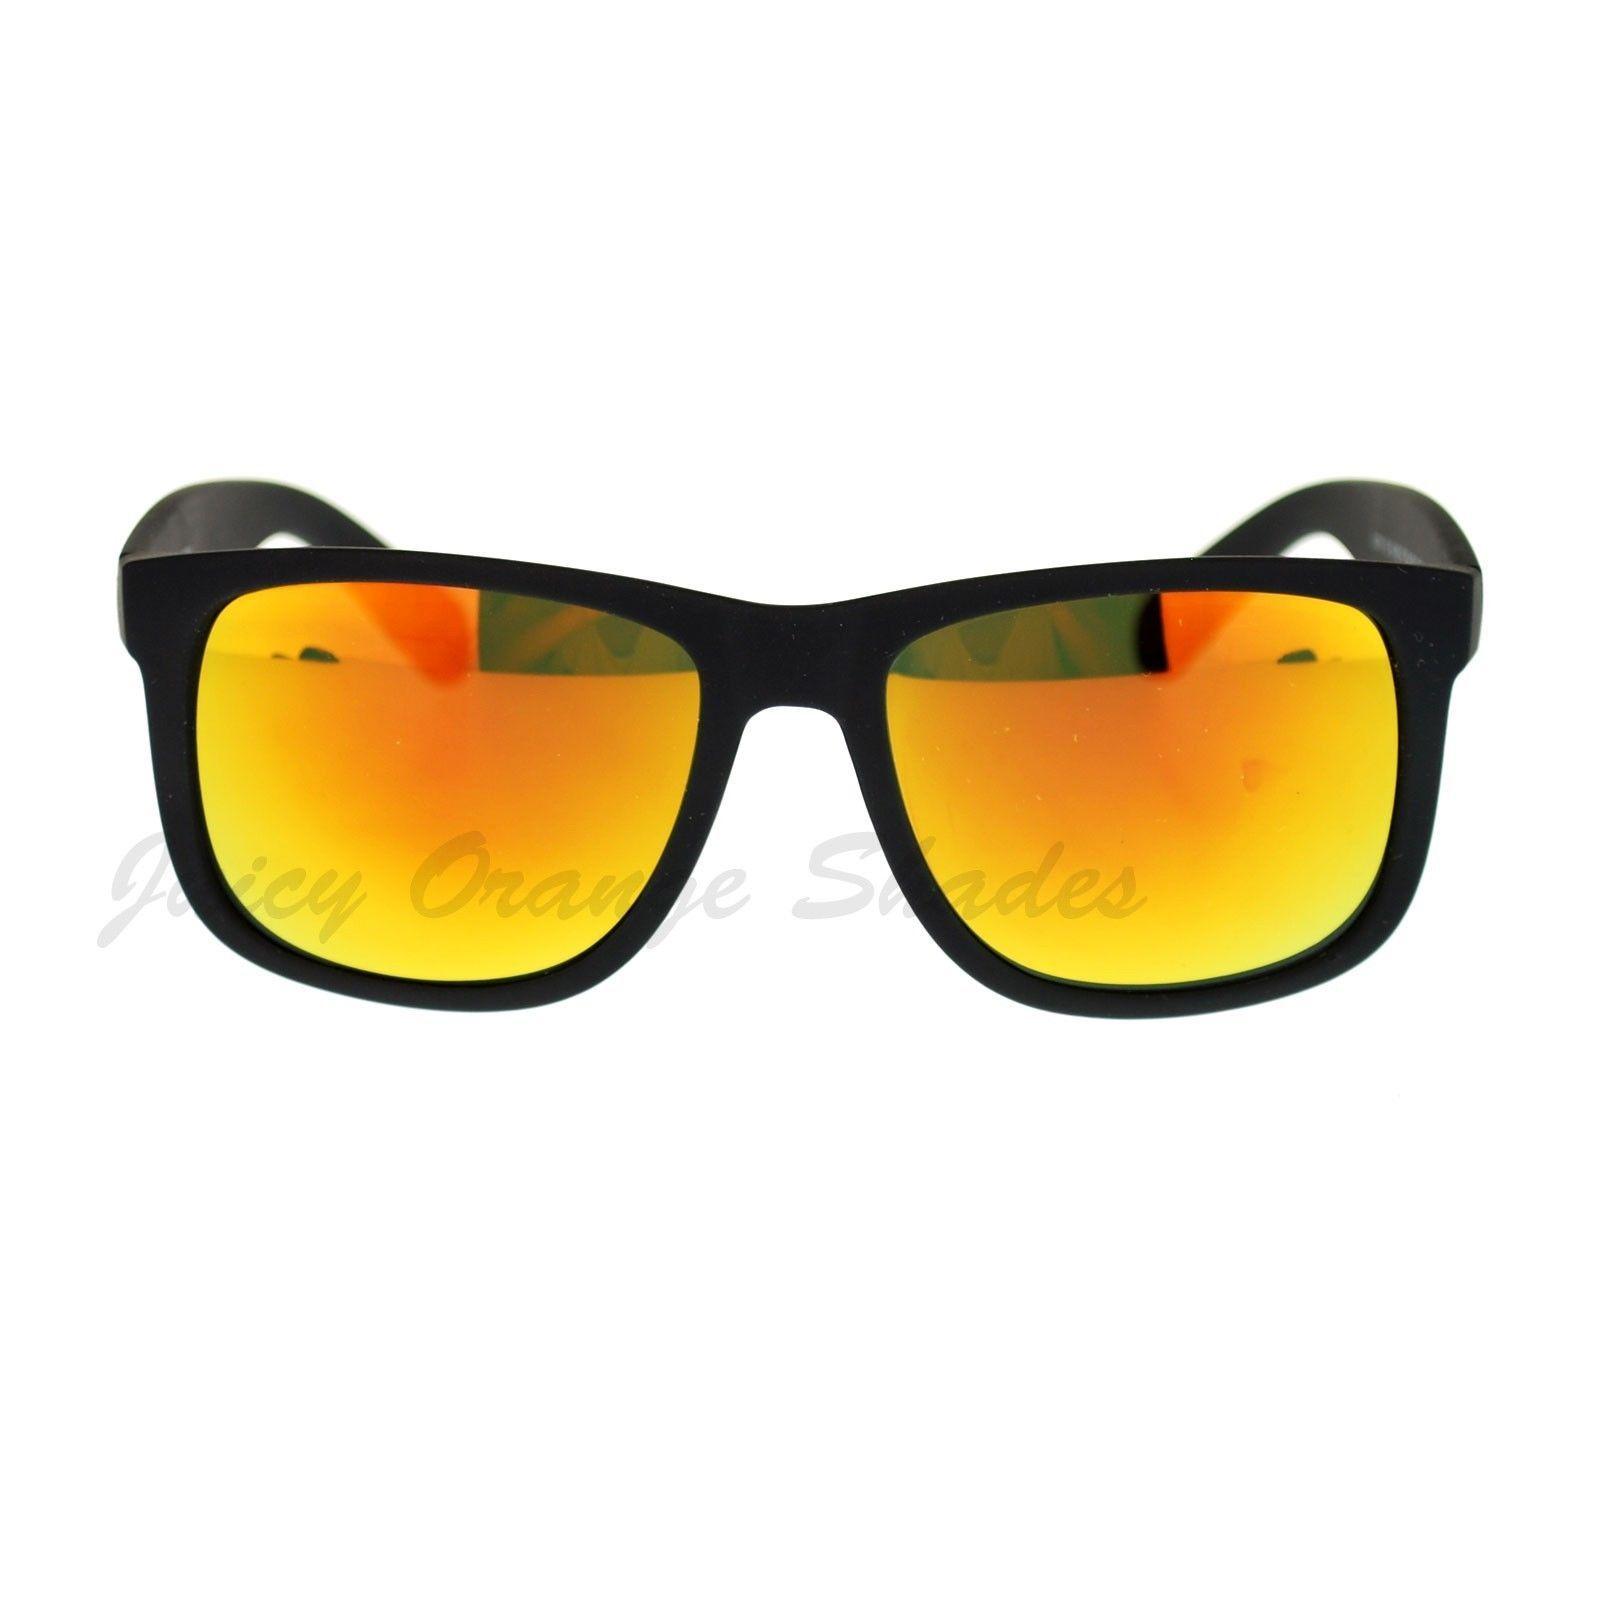 Unisex Sunglasses Black Matted Square Frame Multicolor Lens